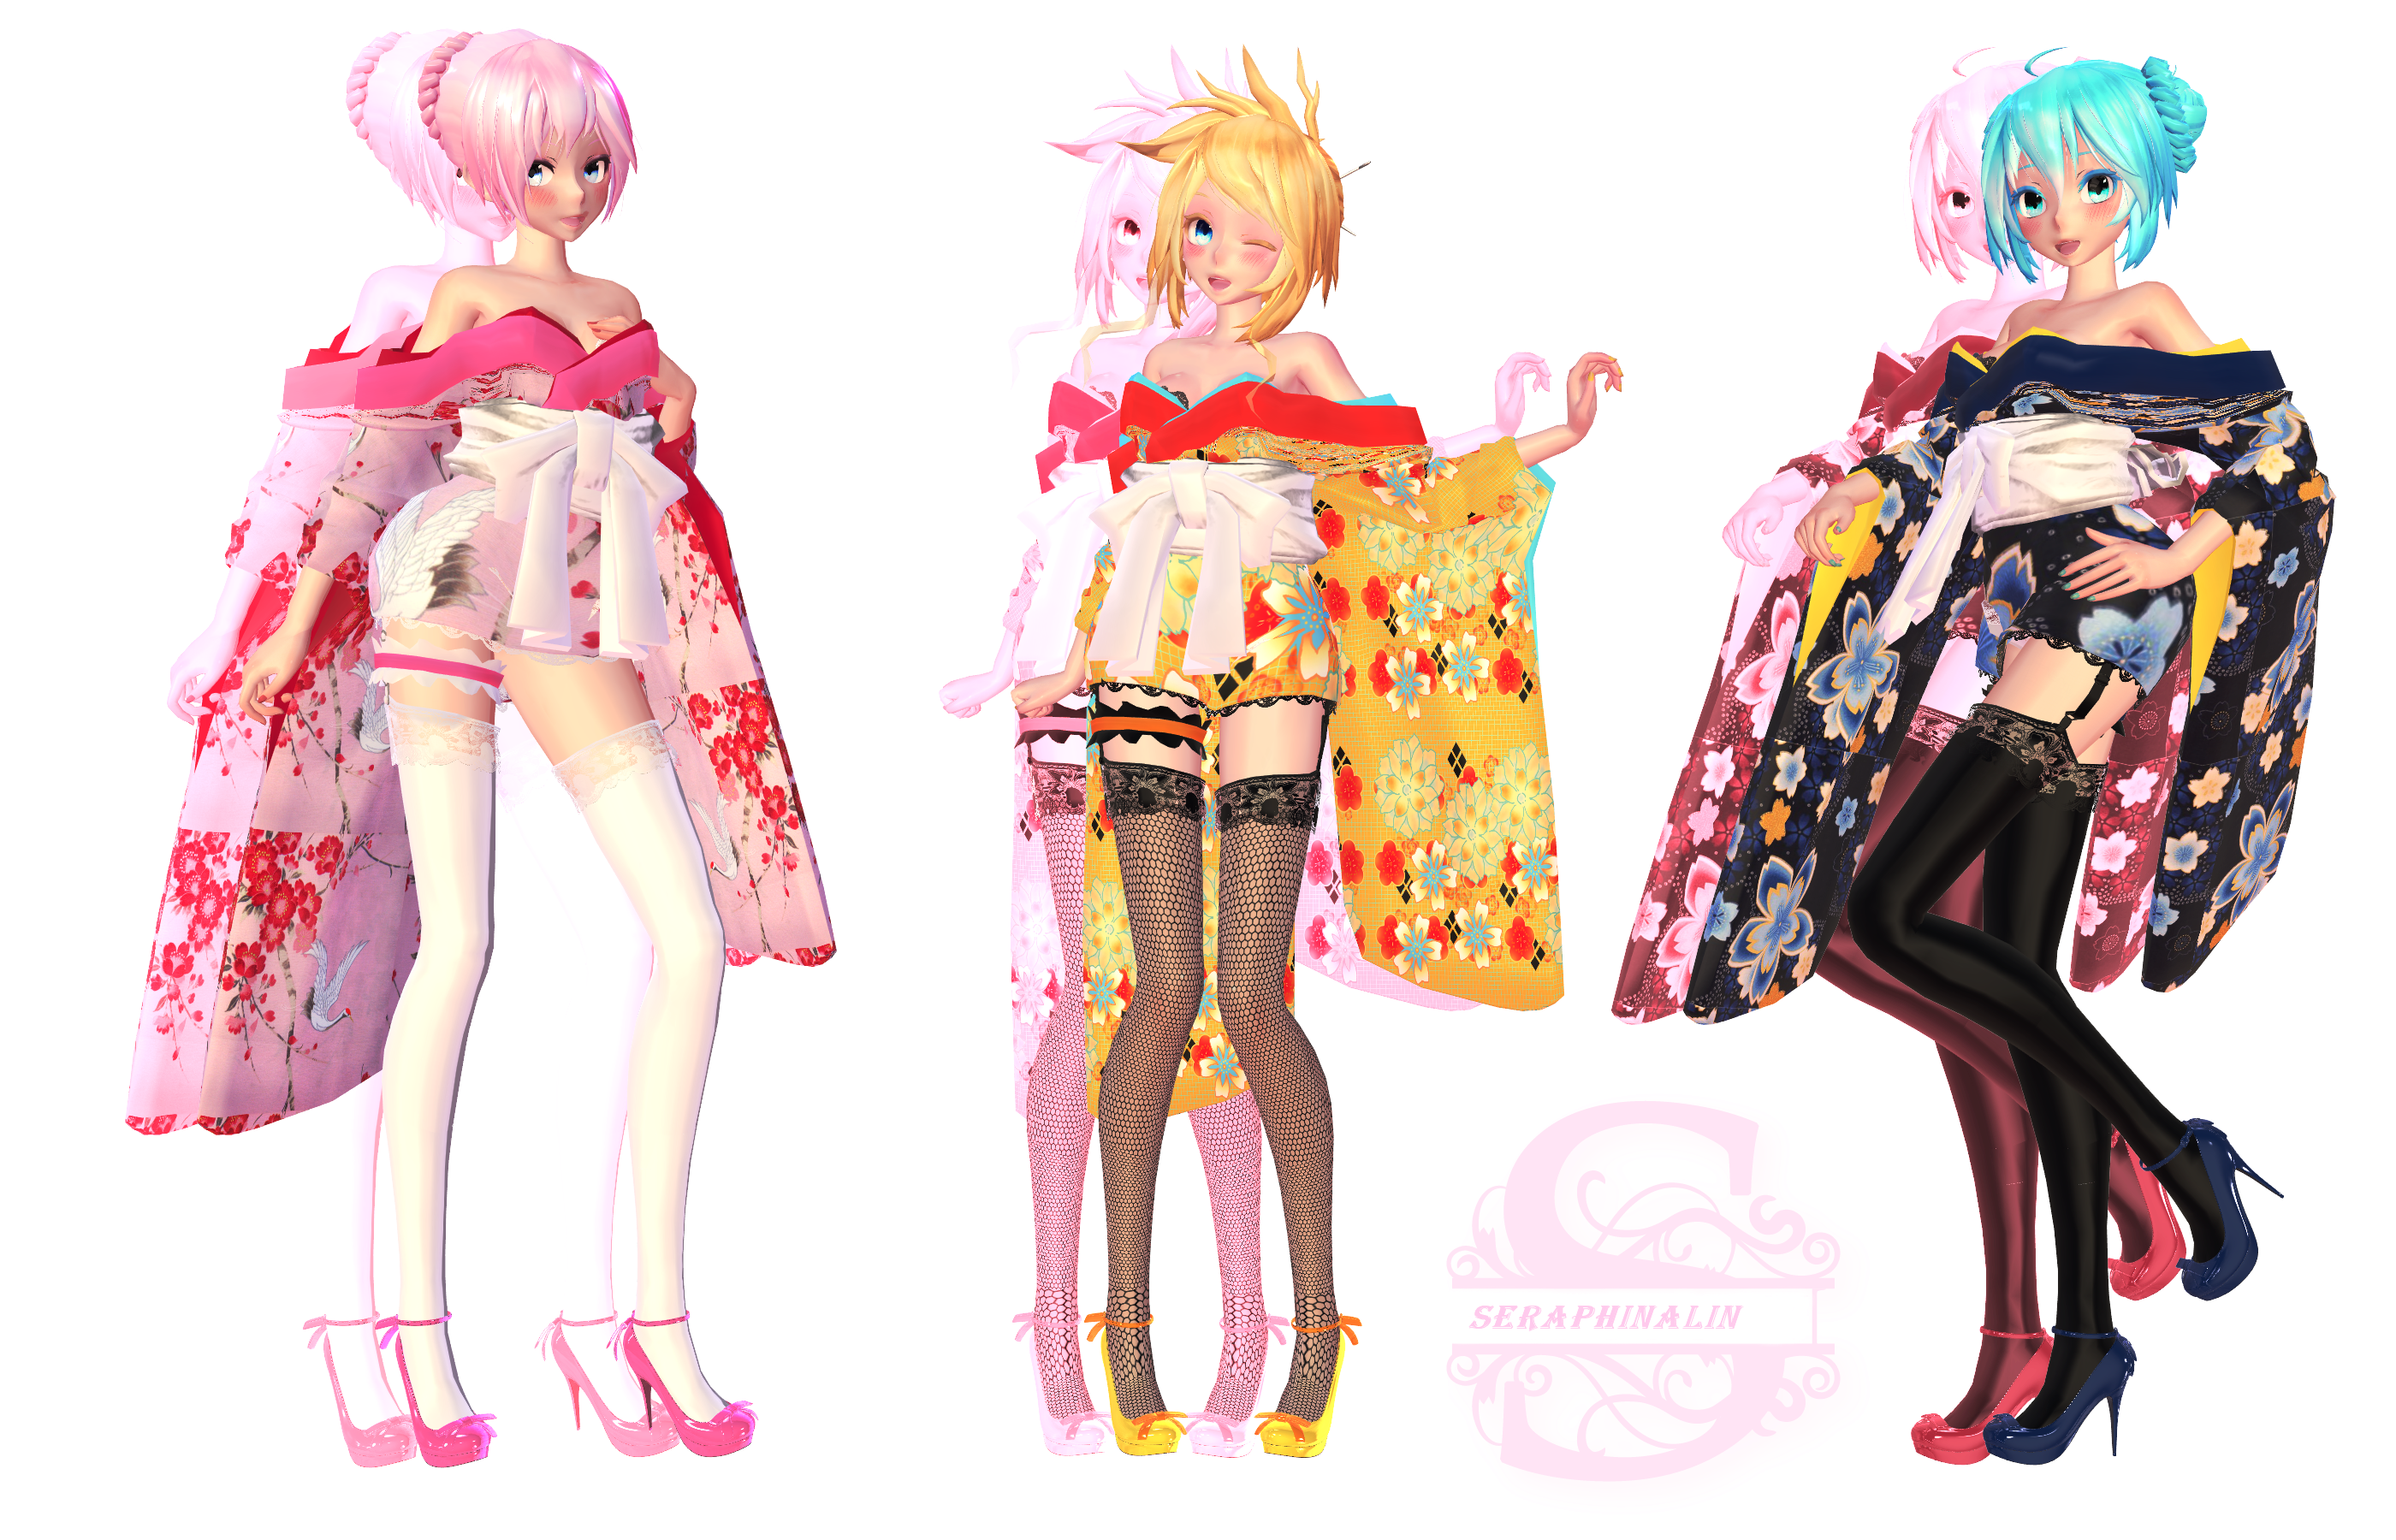 Tda Short Kimono Pack 1 by Evelyn-sama